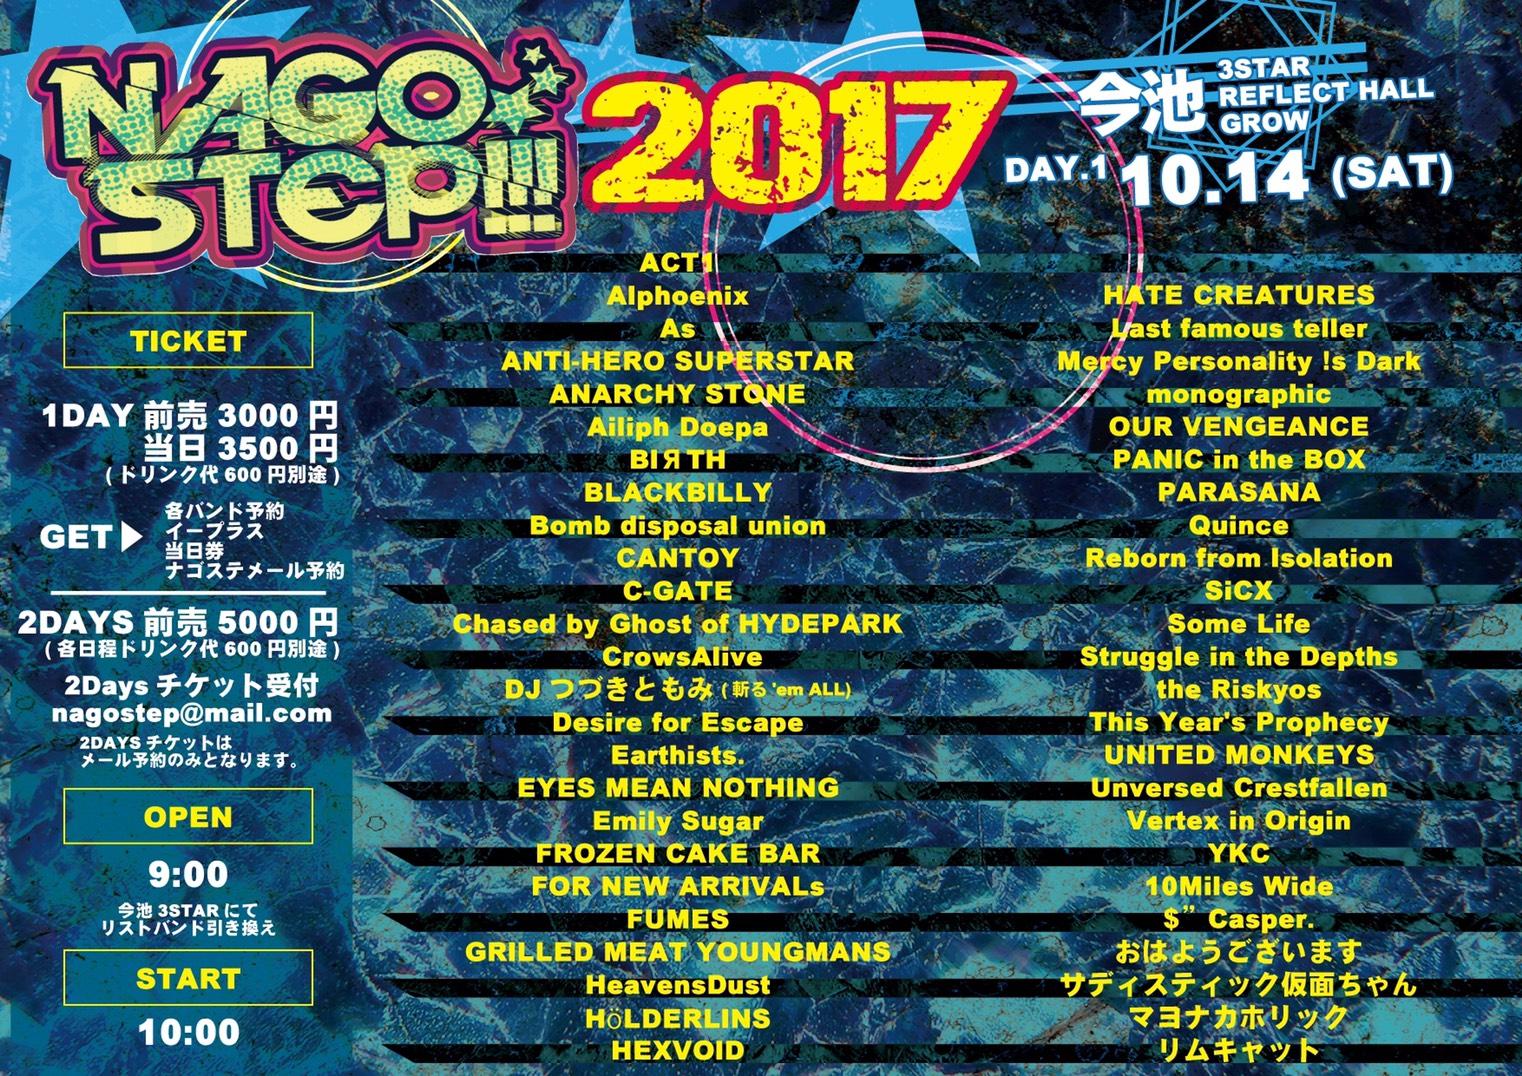 2017.10.14(sat) 今池CLUB 3STAR